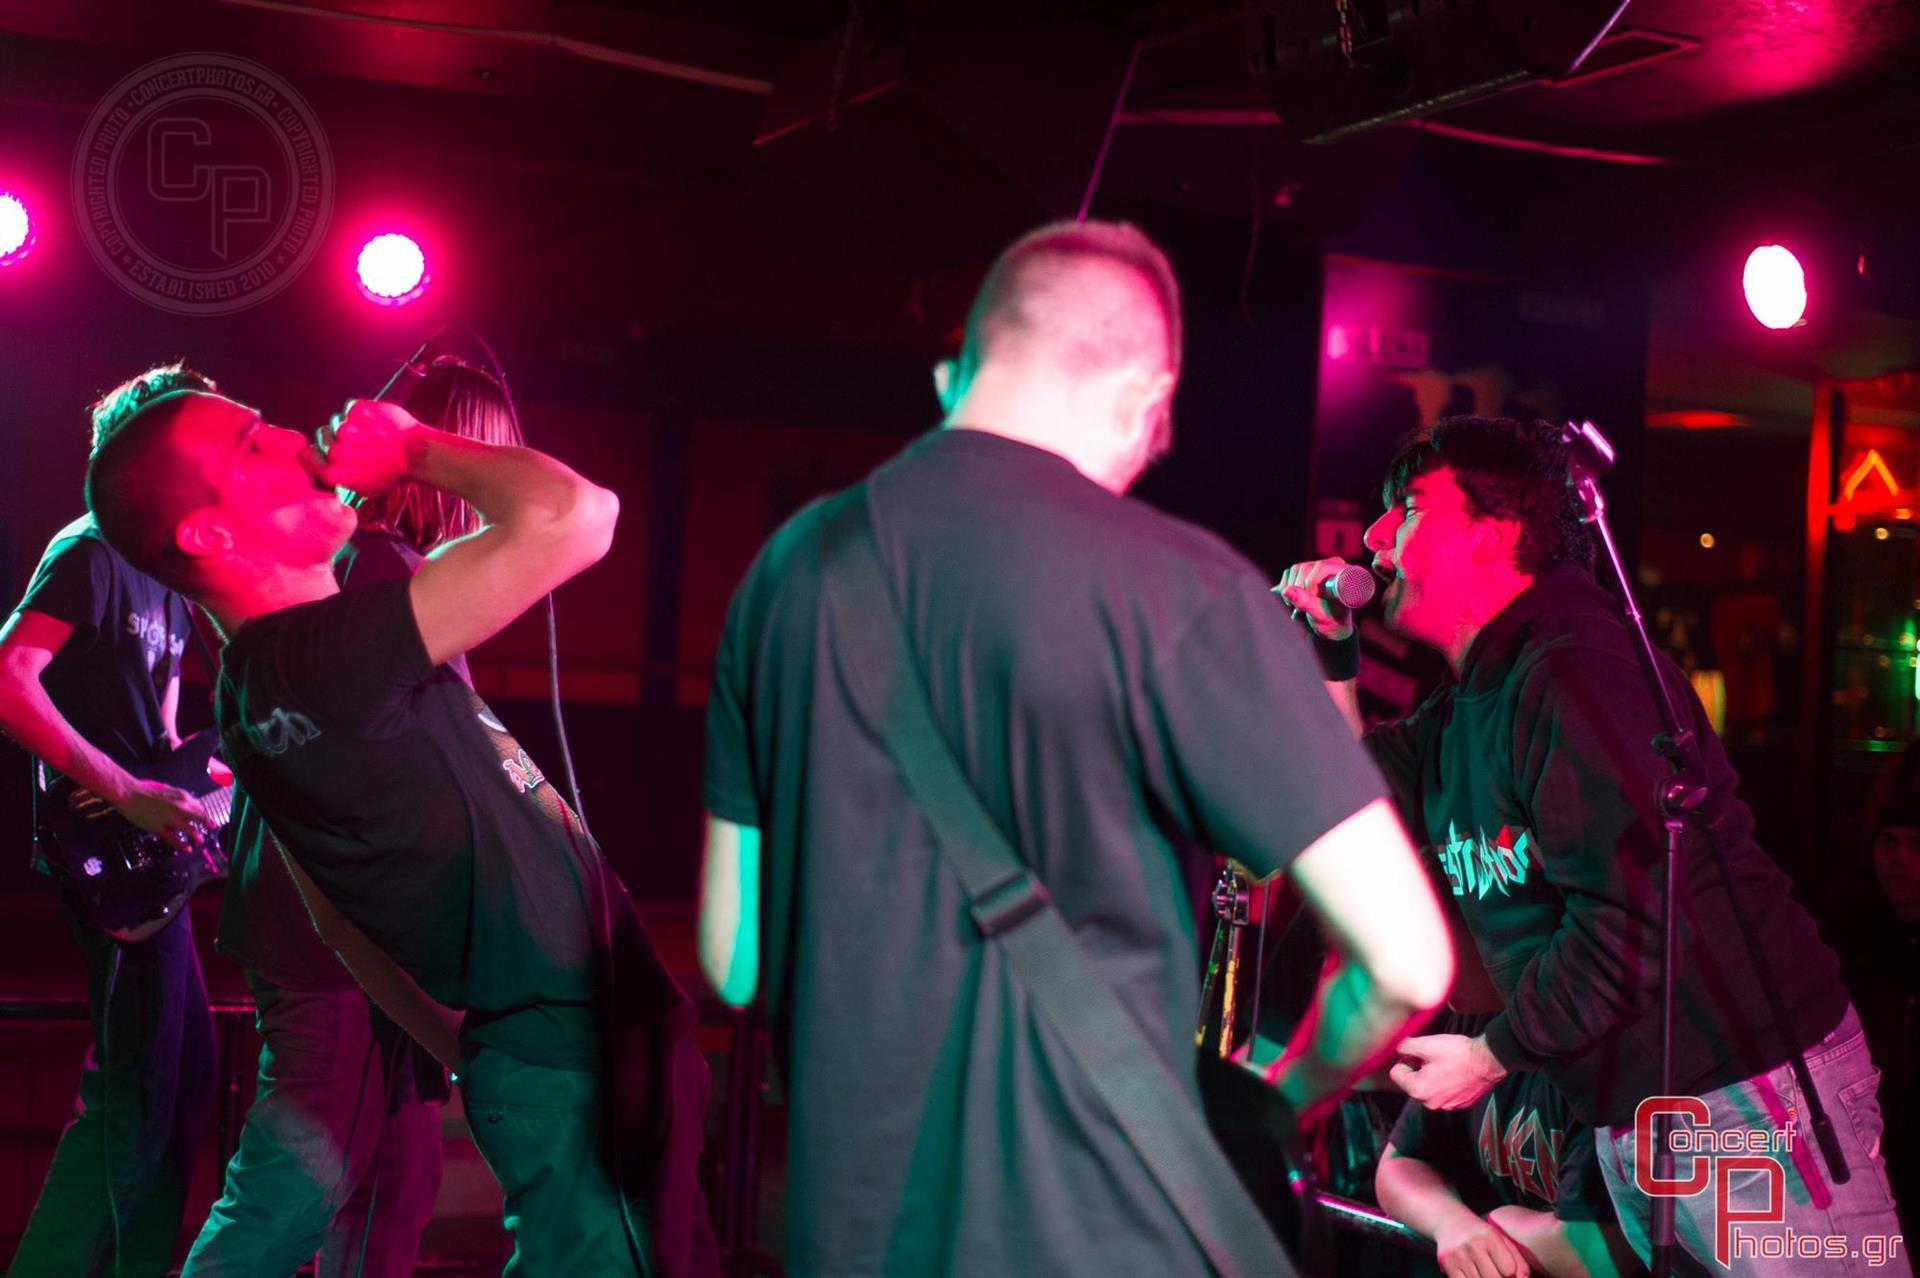 Battle Of The Bands Athens - Leg 3- photographer:  - ConcertPhotos - 20150104_2103_15